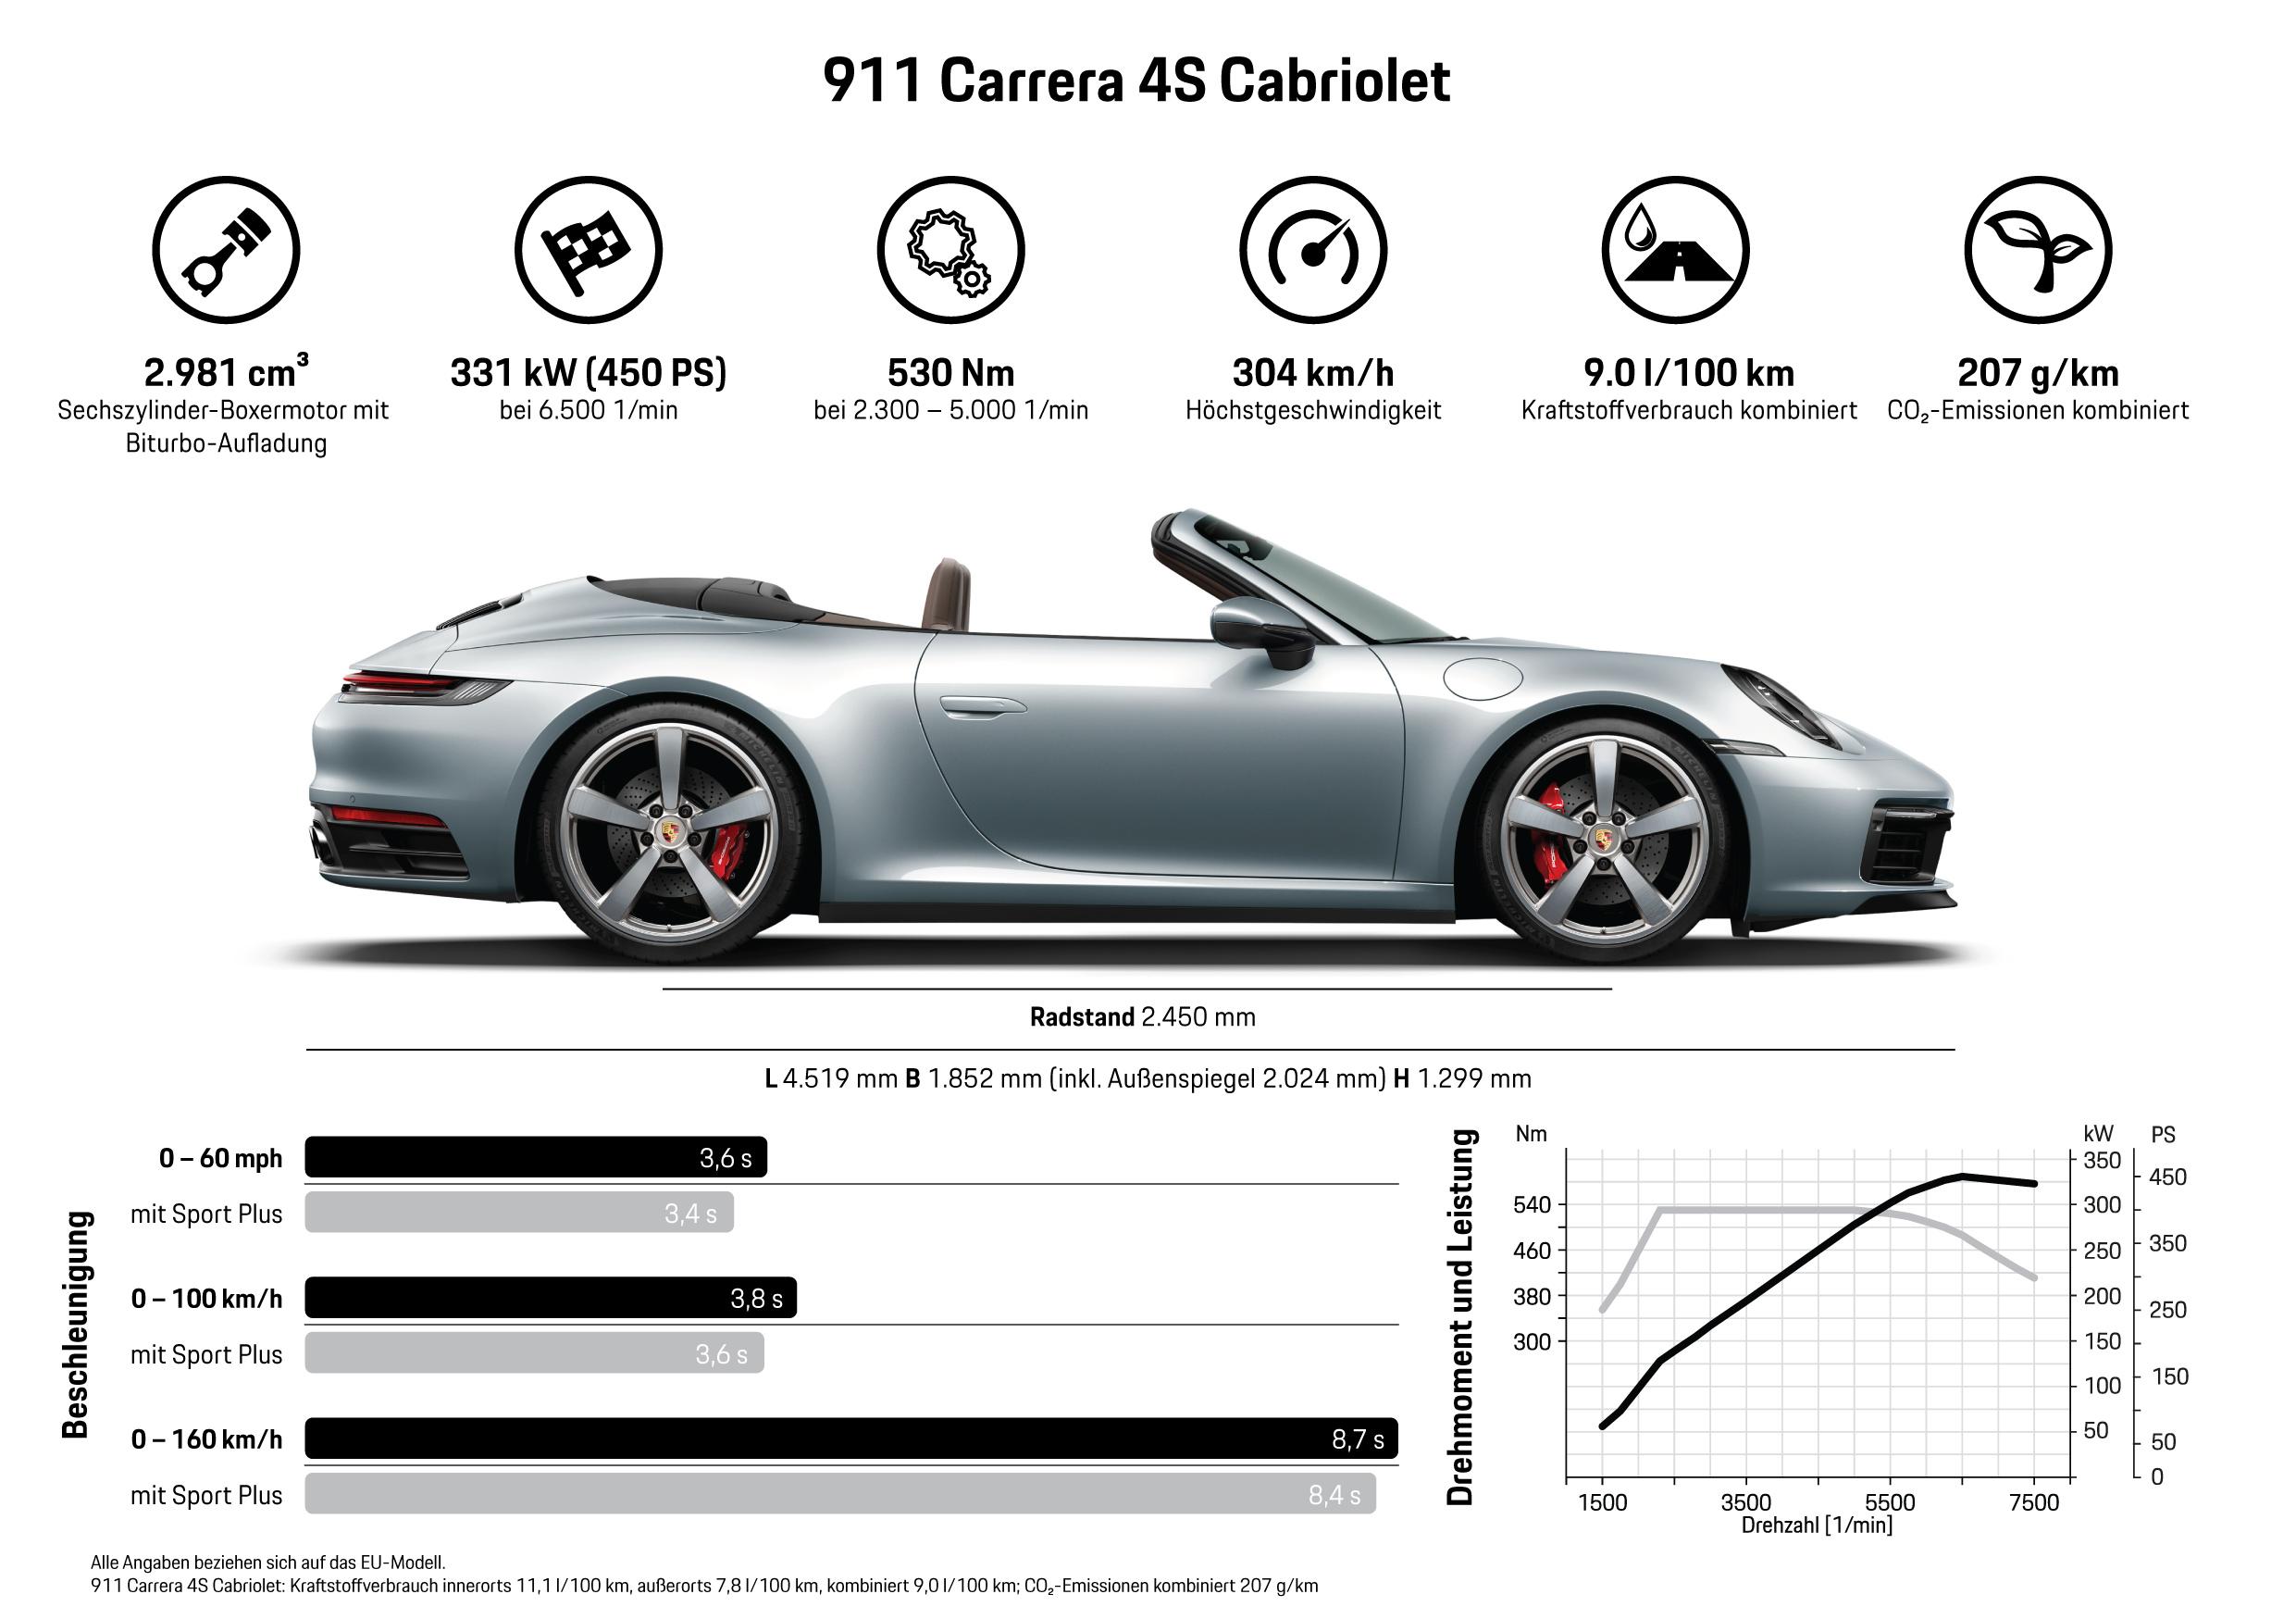 911 Carrera 4S Cabriolet, Infografik, 2019, Porsche AG